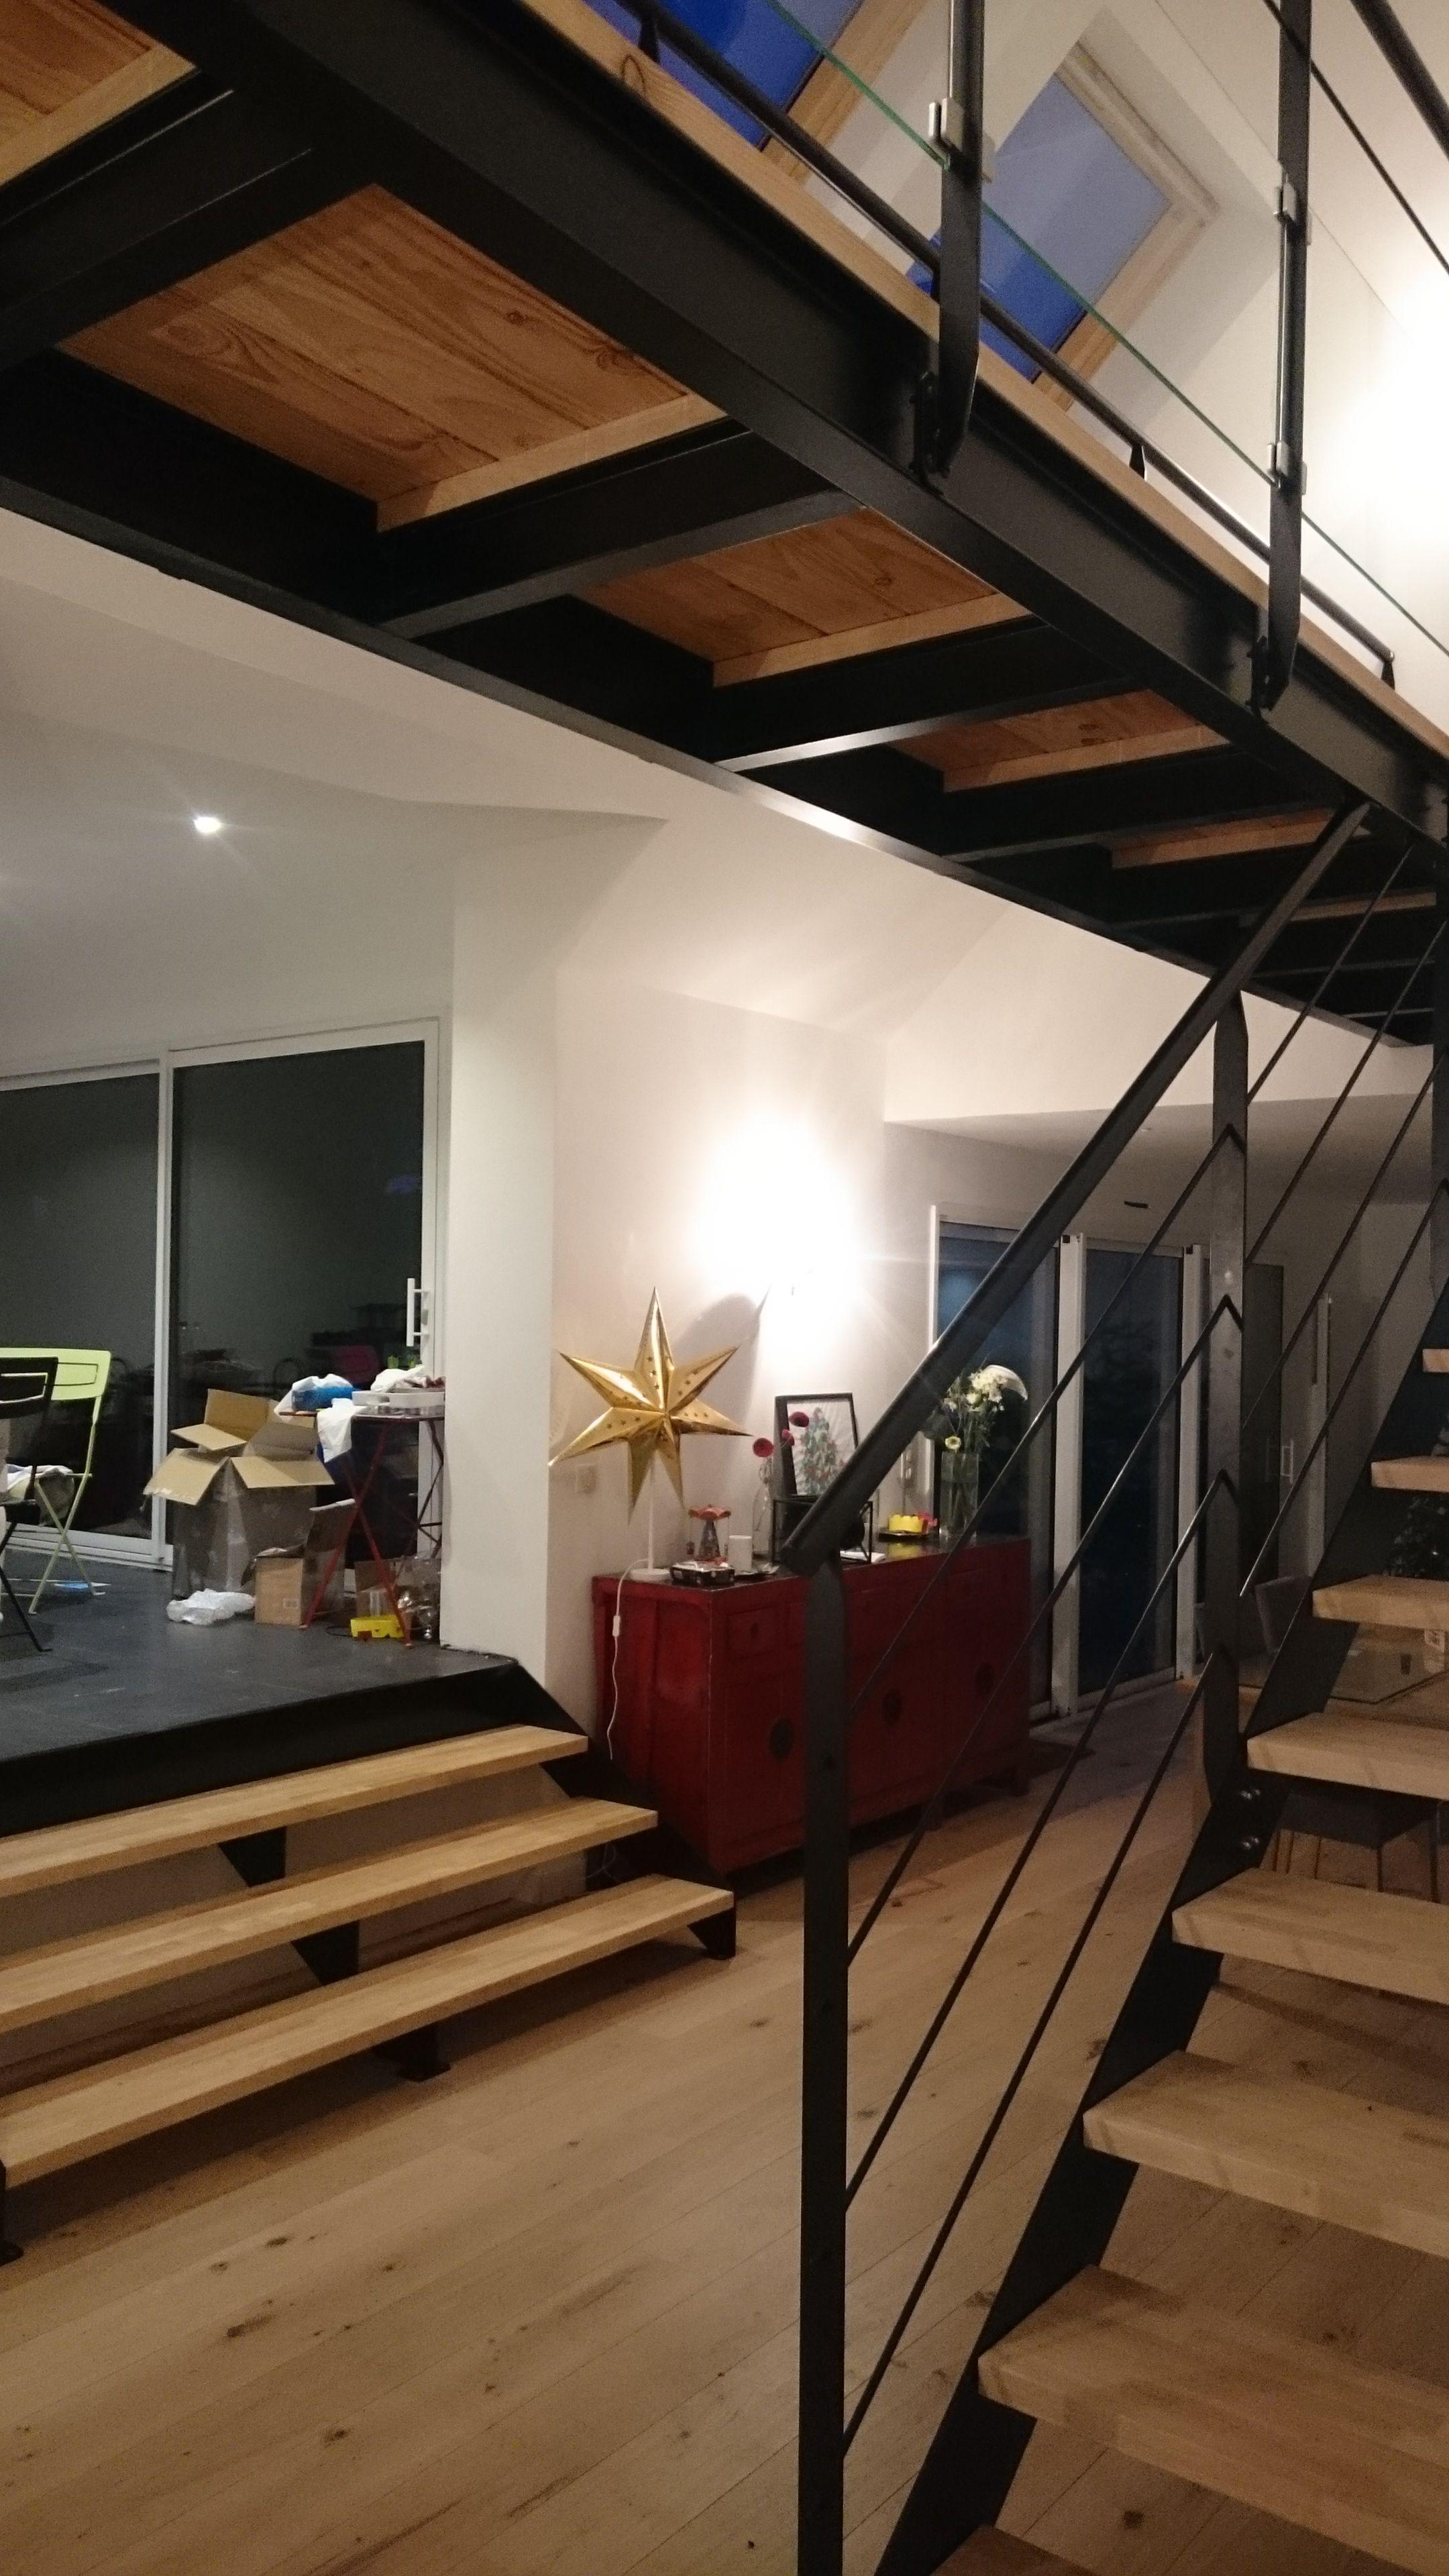 escalier m tallique contemporain passerelle suspendue ipn art m tal concept quimper http. Black Bedroom Furniture Sets. Home Design Ideas